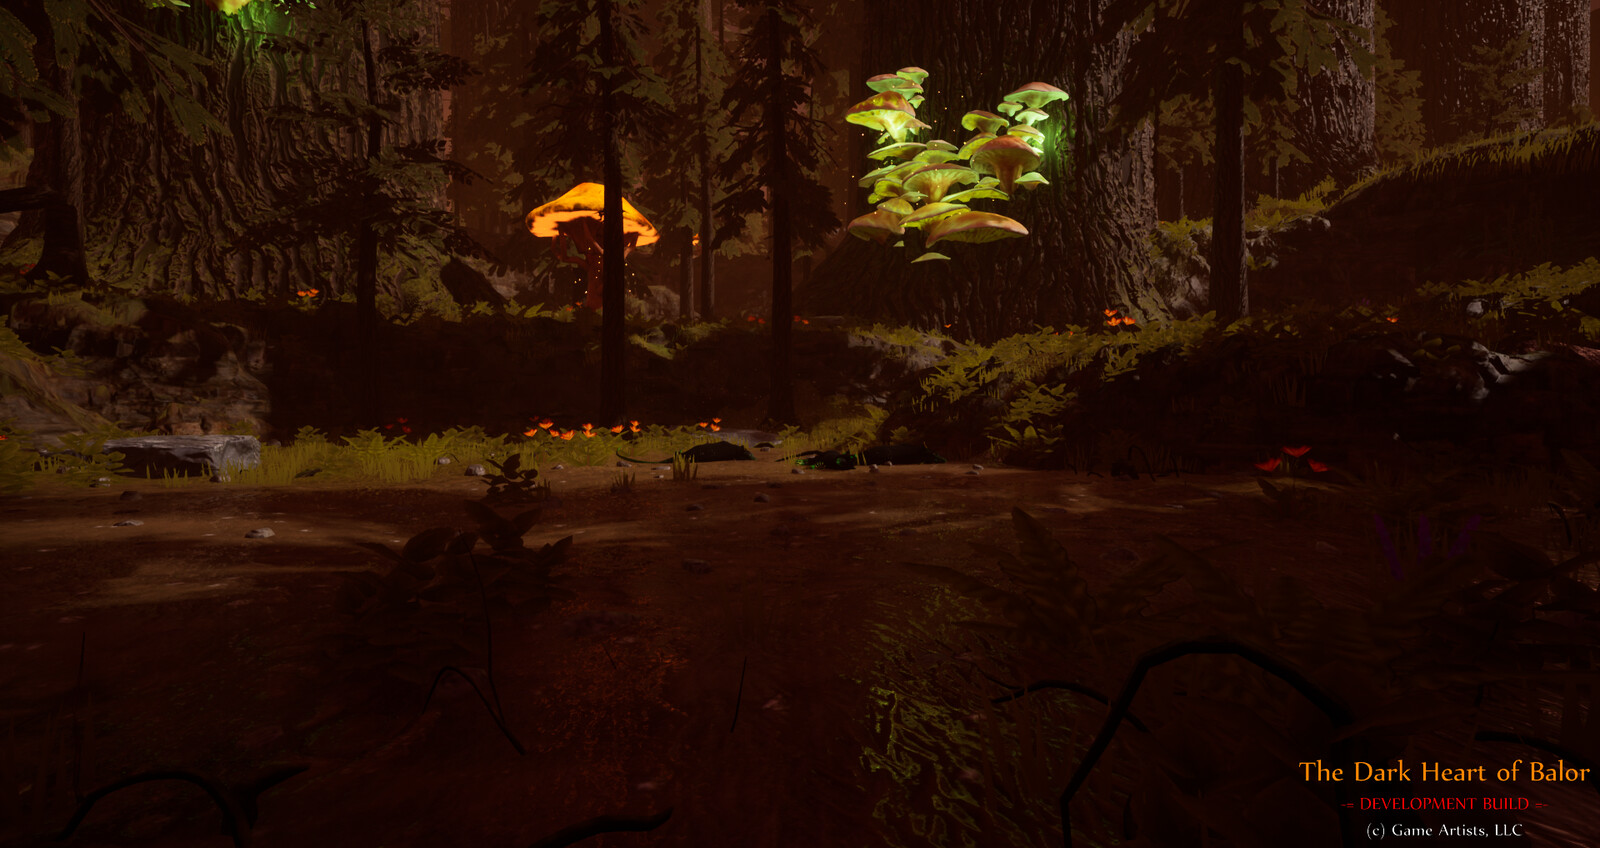 The Dark Heart of Balor Dev Shots